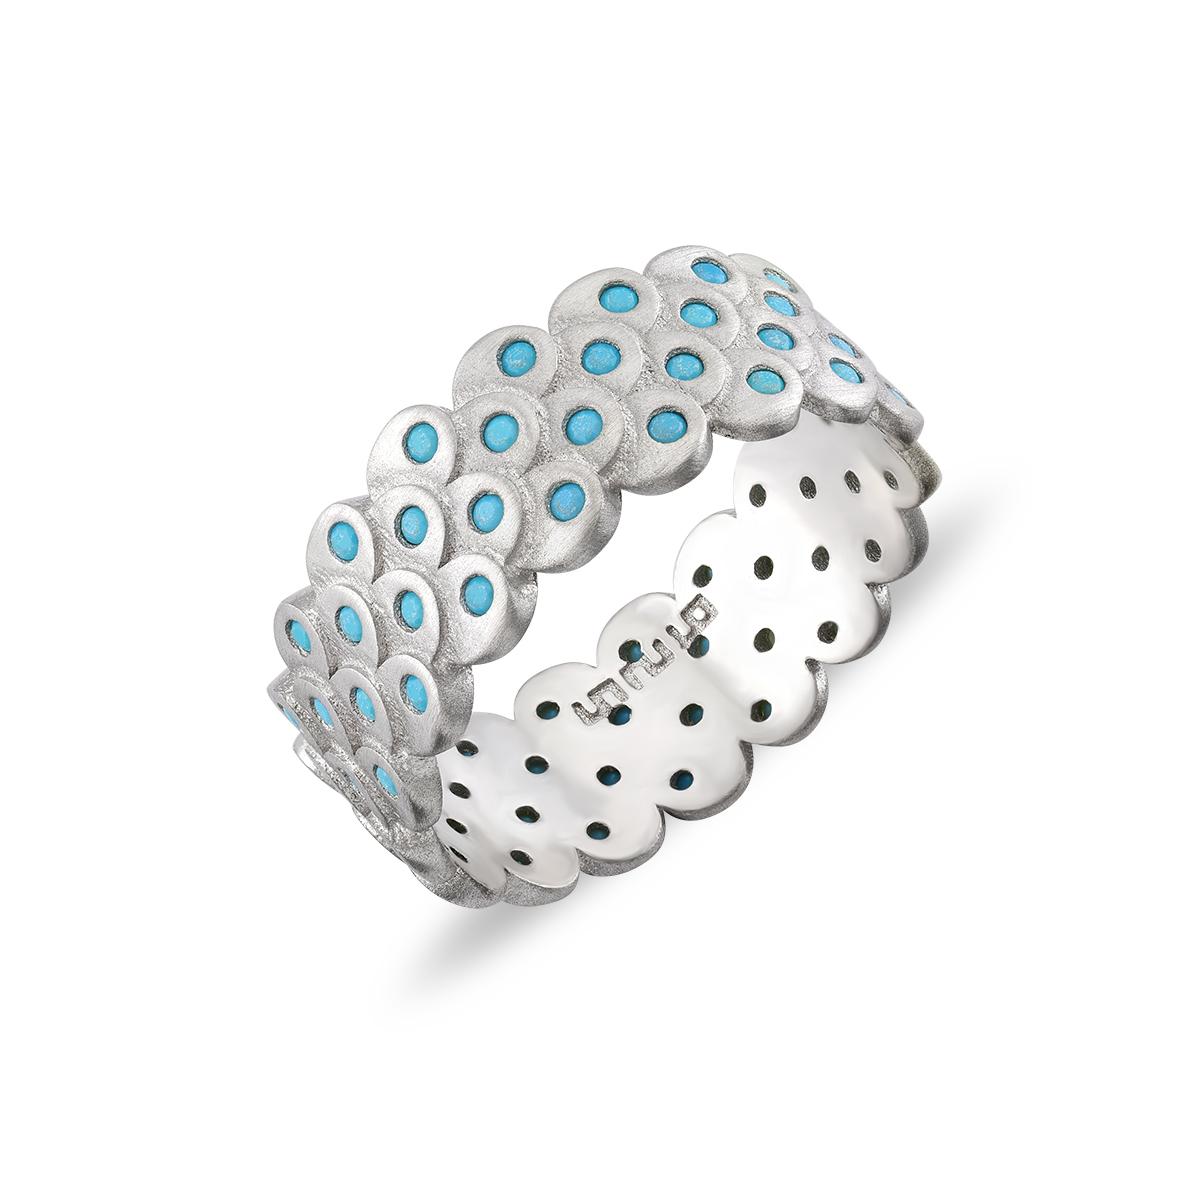 Mermaid Silver Ring - High Street Jewelry